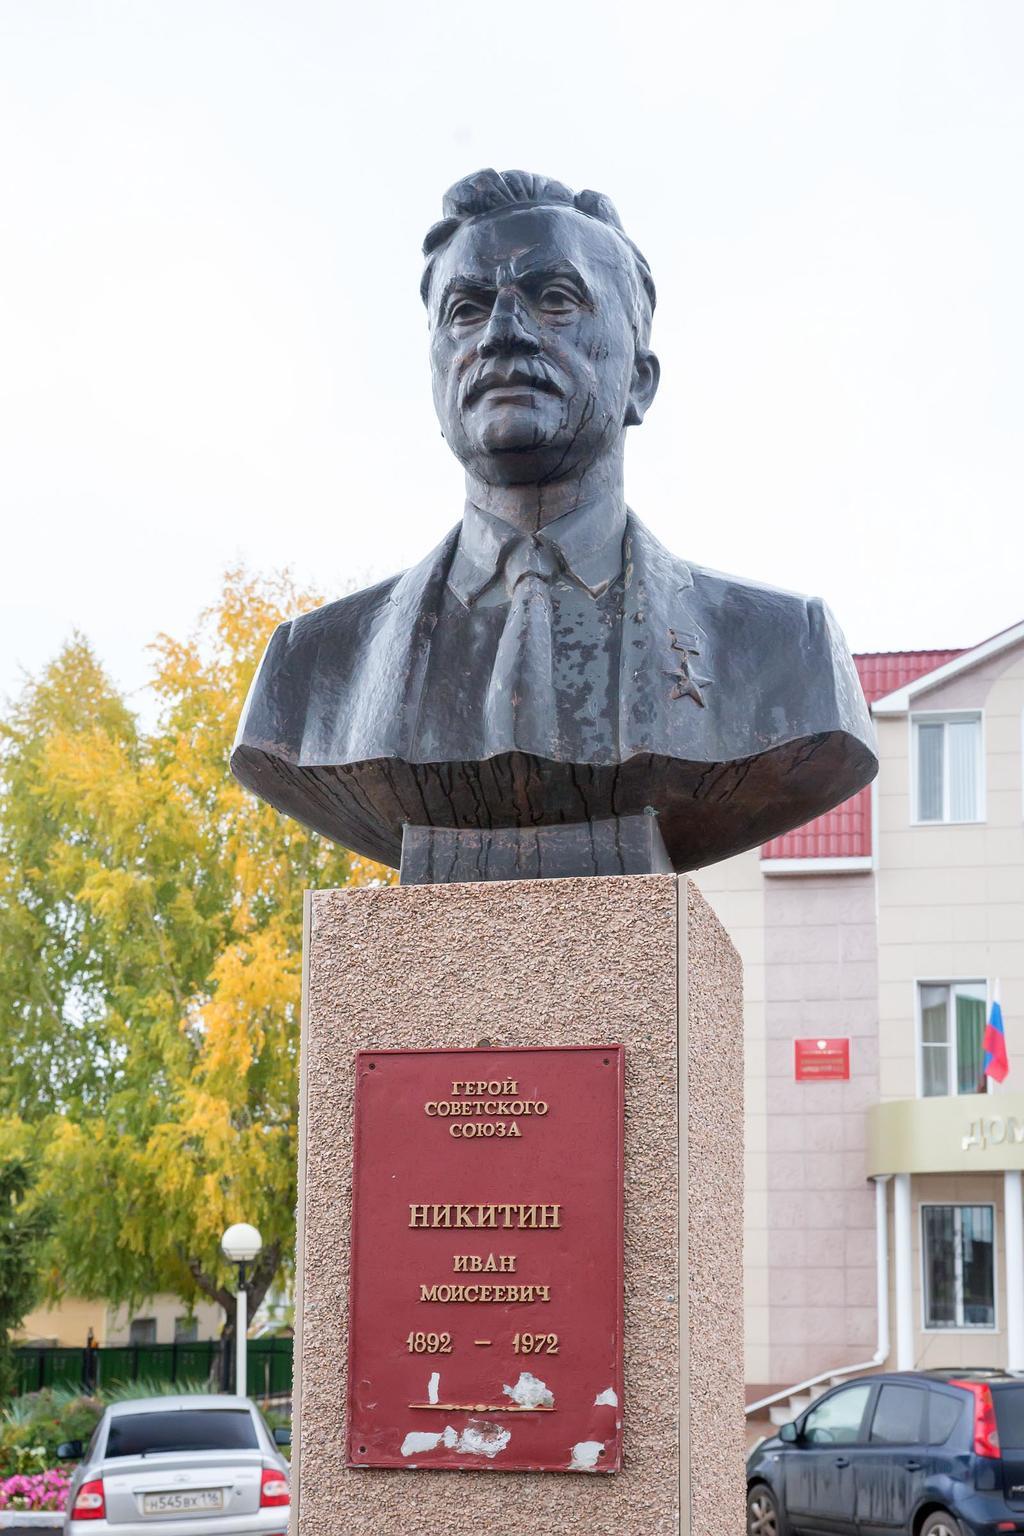 Никитин Иван Моисеевич 1892-1972, Герой Советского Союза ©Tatfrontu.ru Photo Archive